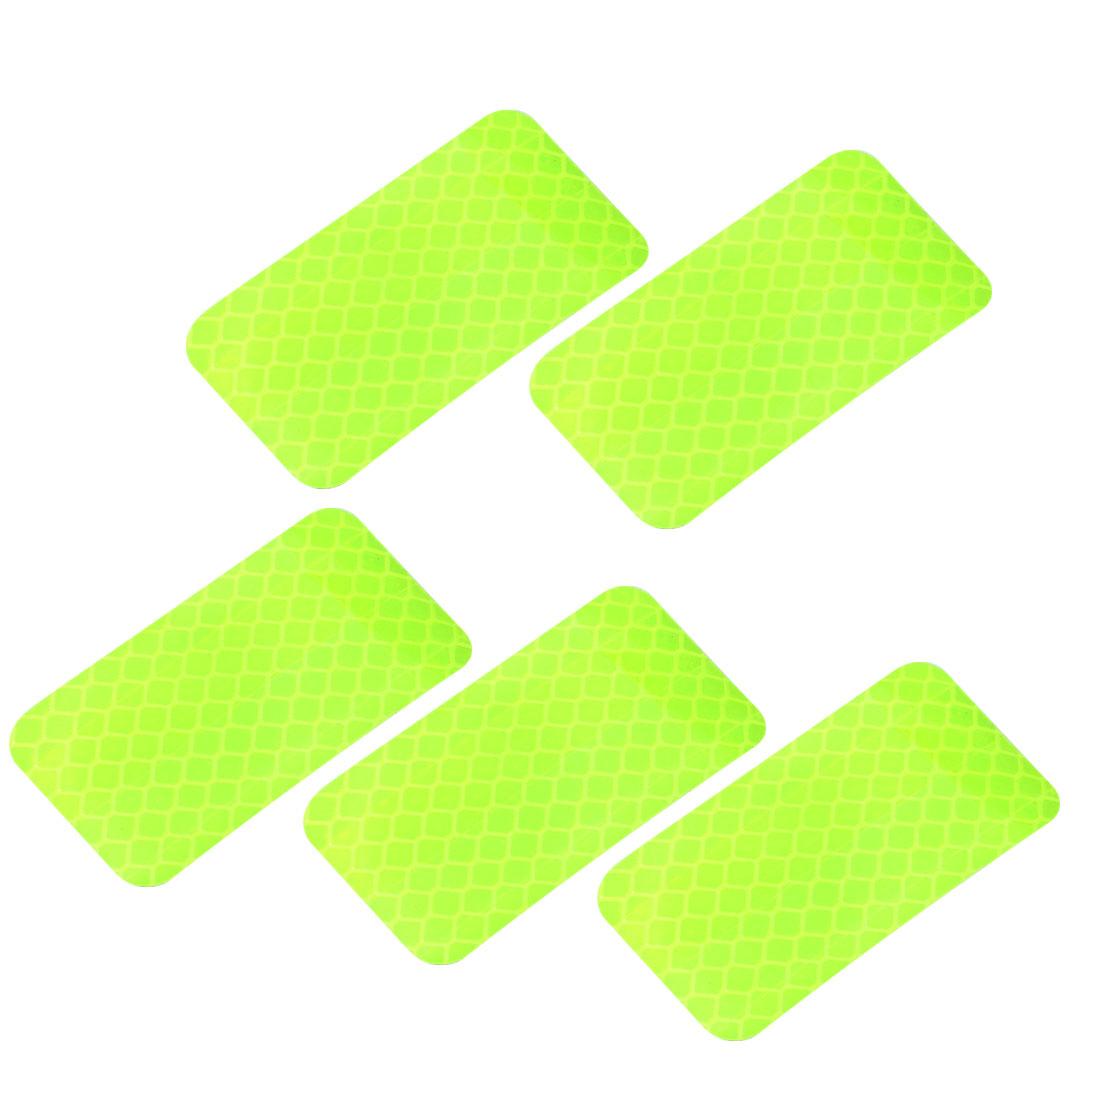 5pcs Honeycomb Reflective Warning Tape Film Sticker Yellow 30mm x 60mm